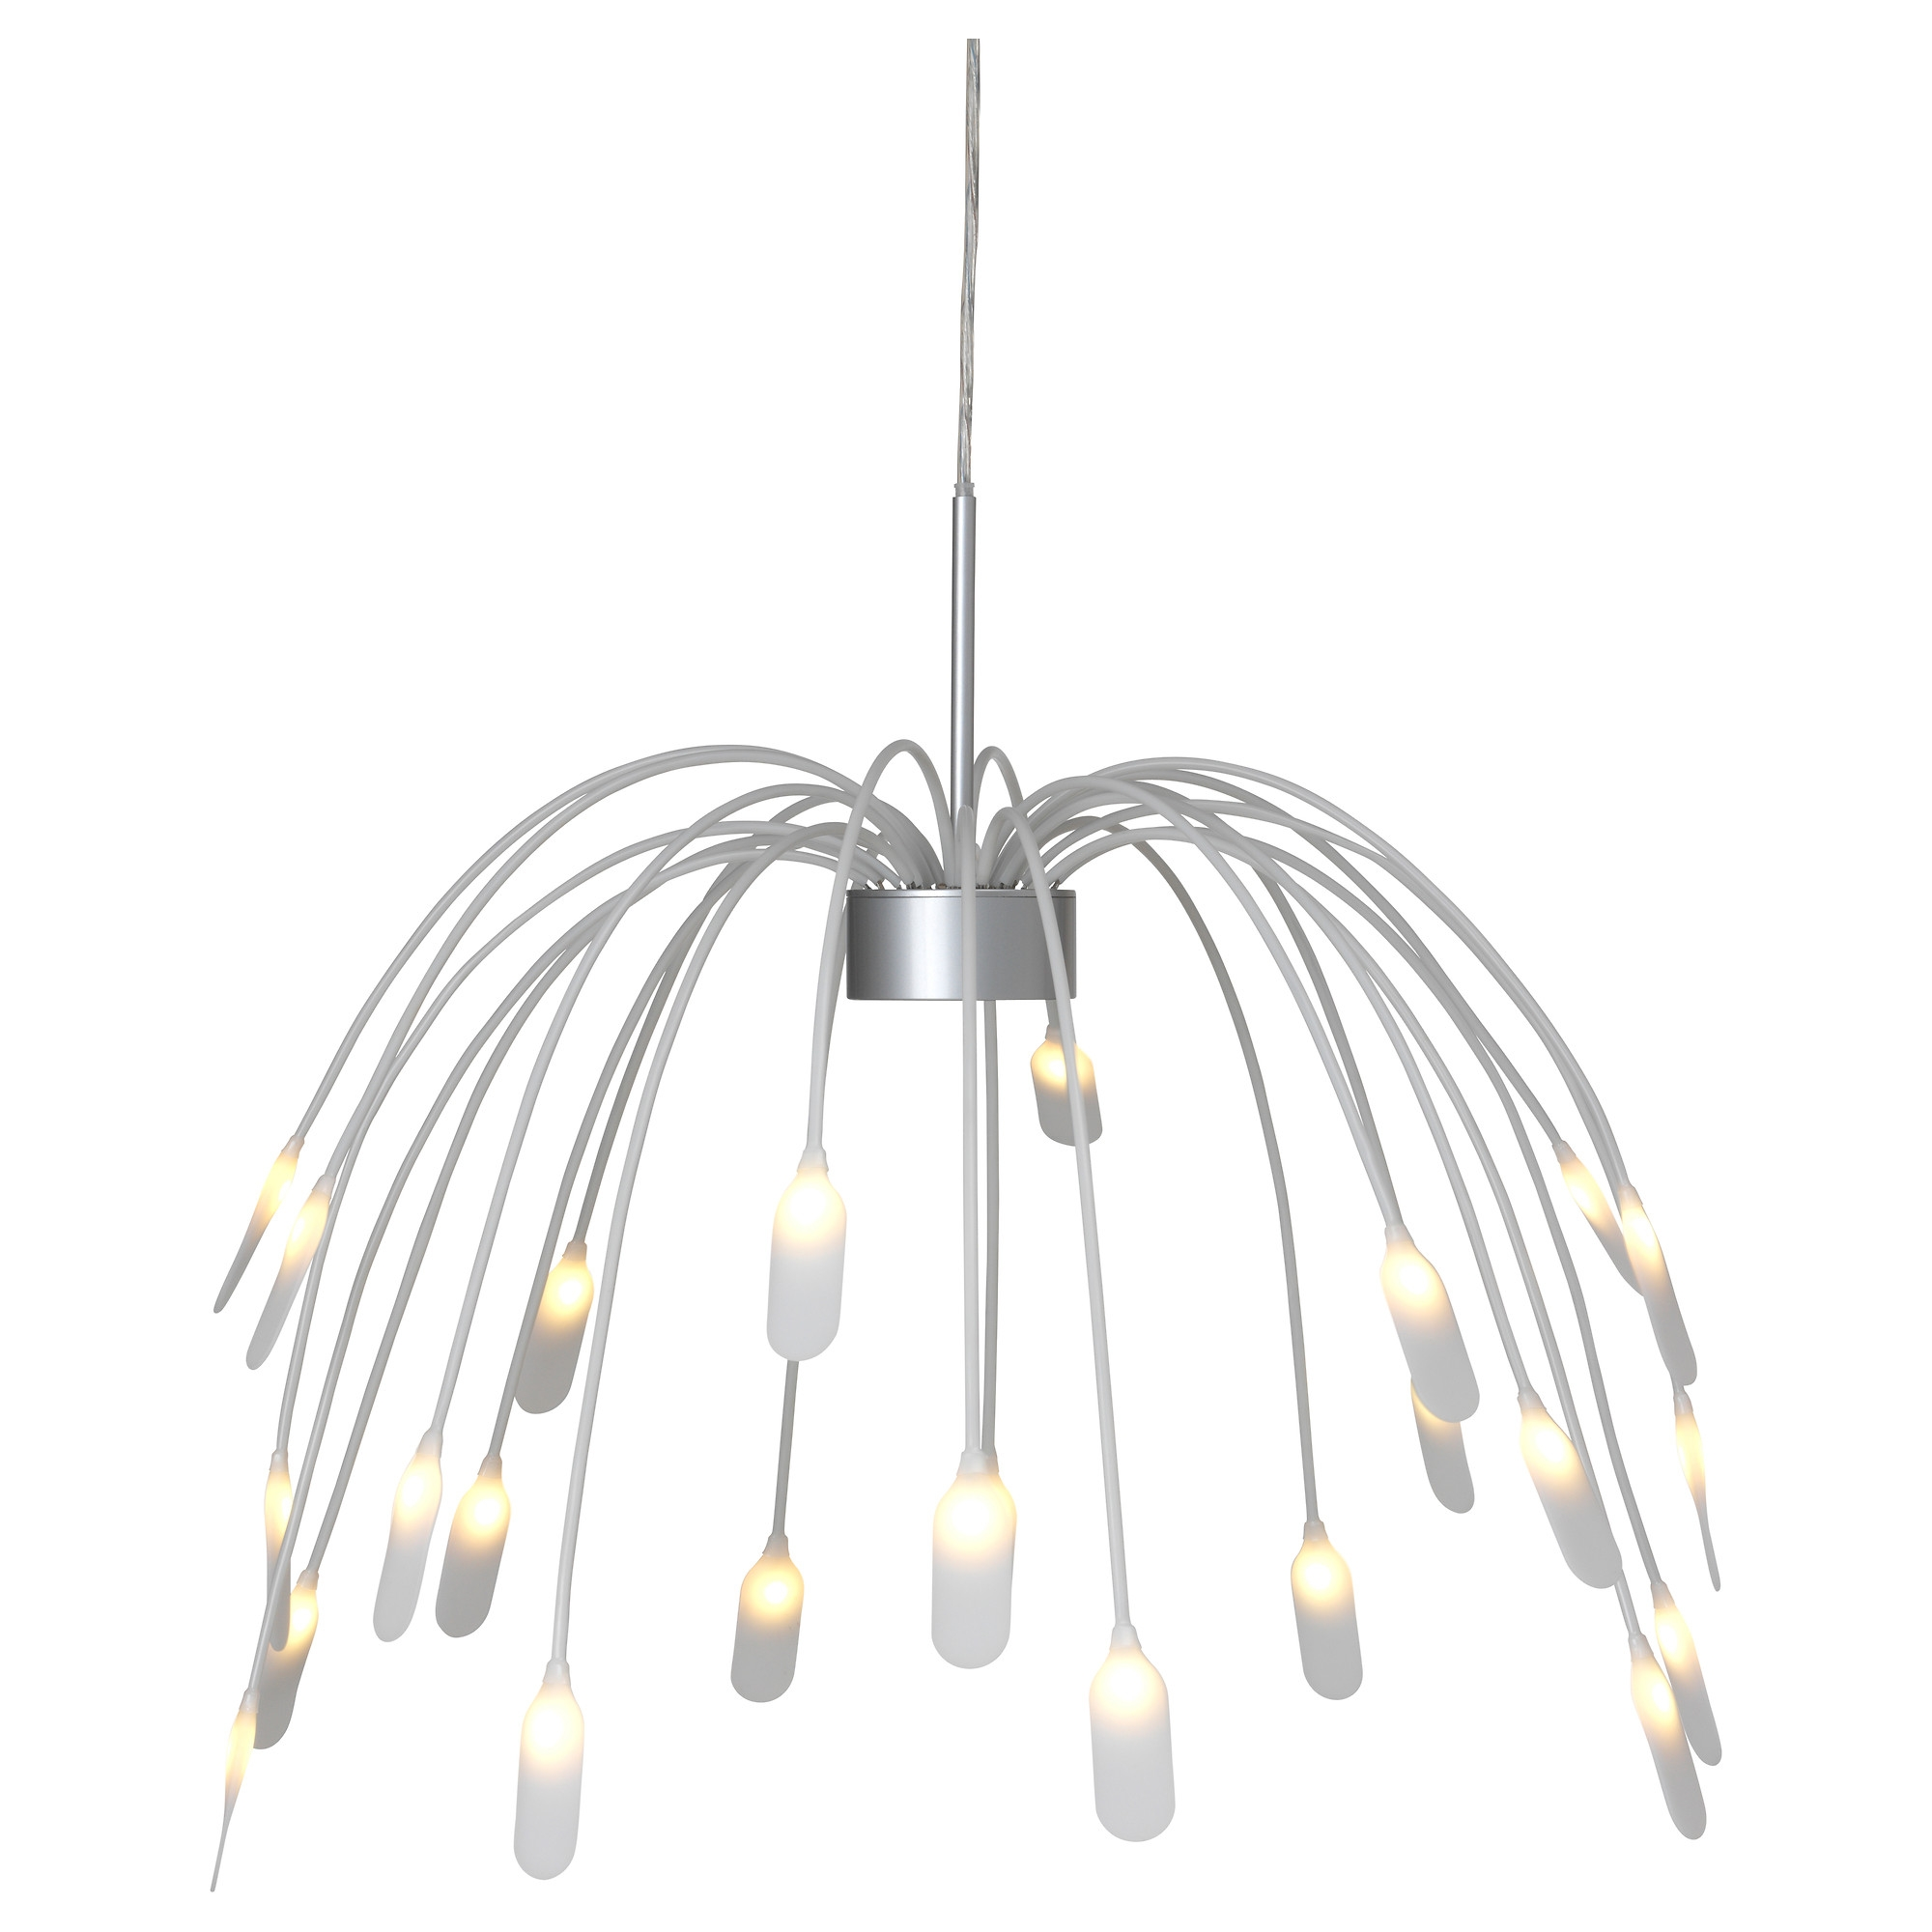 Ikea tenerife detalles producto - Lamparas tenerife ...